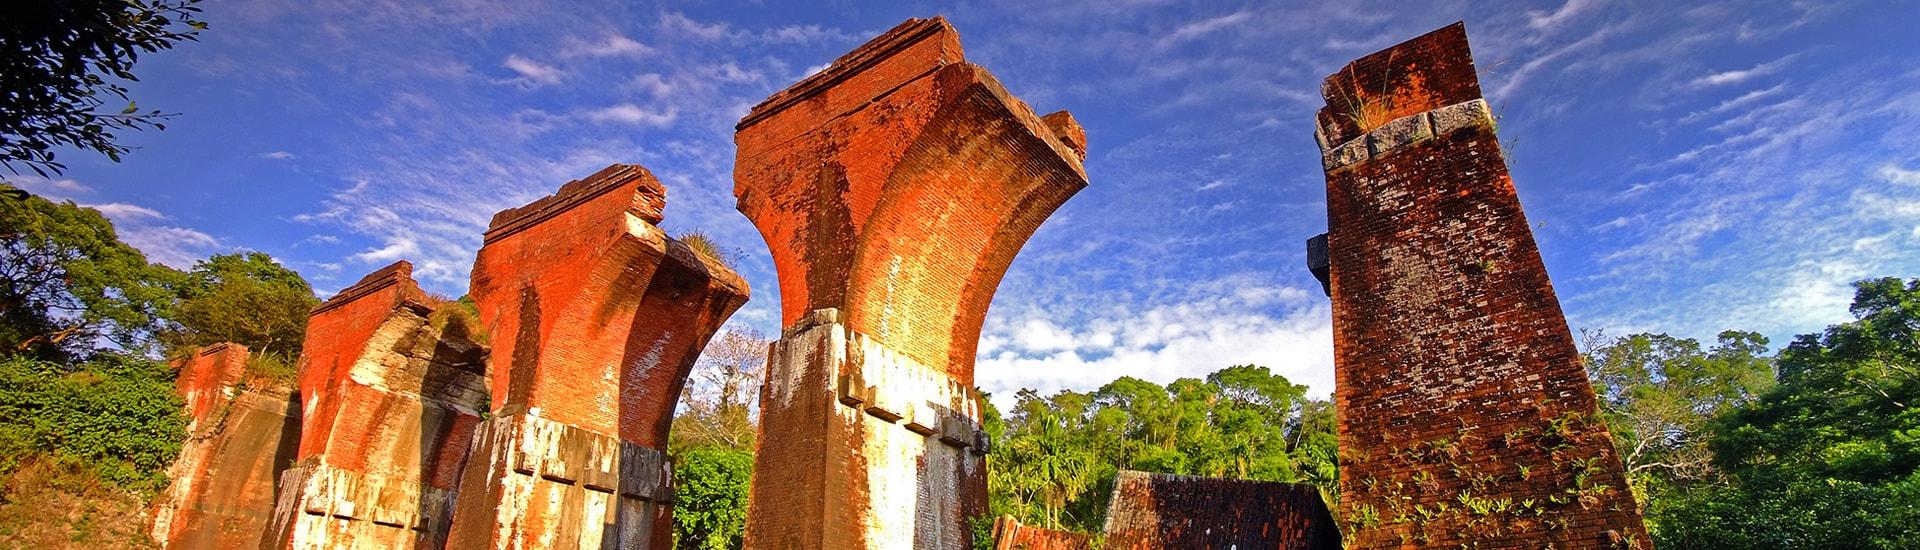 Remains of Longteng Bridge